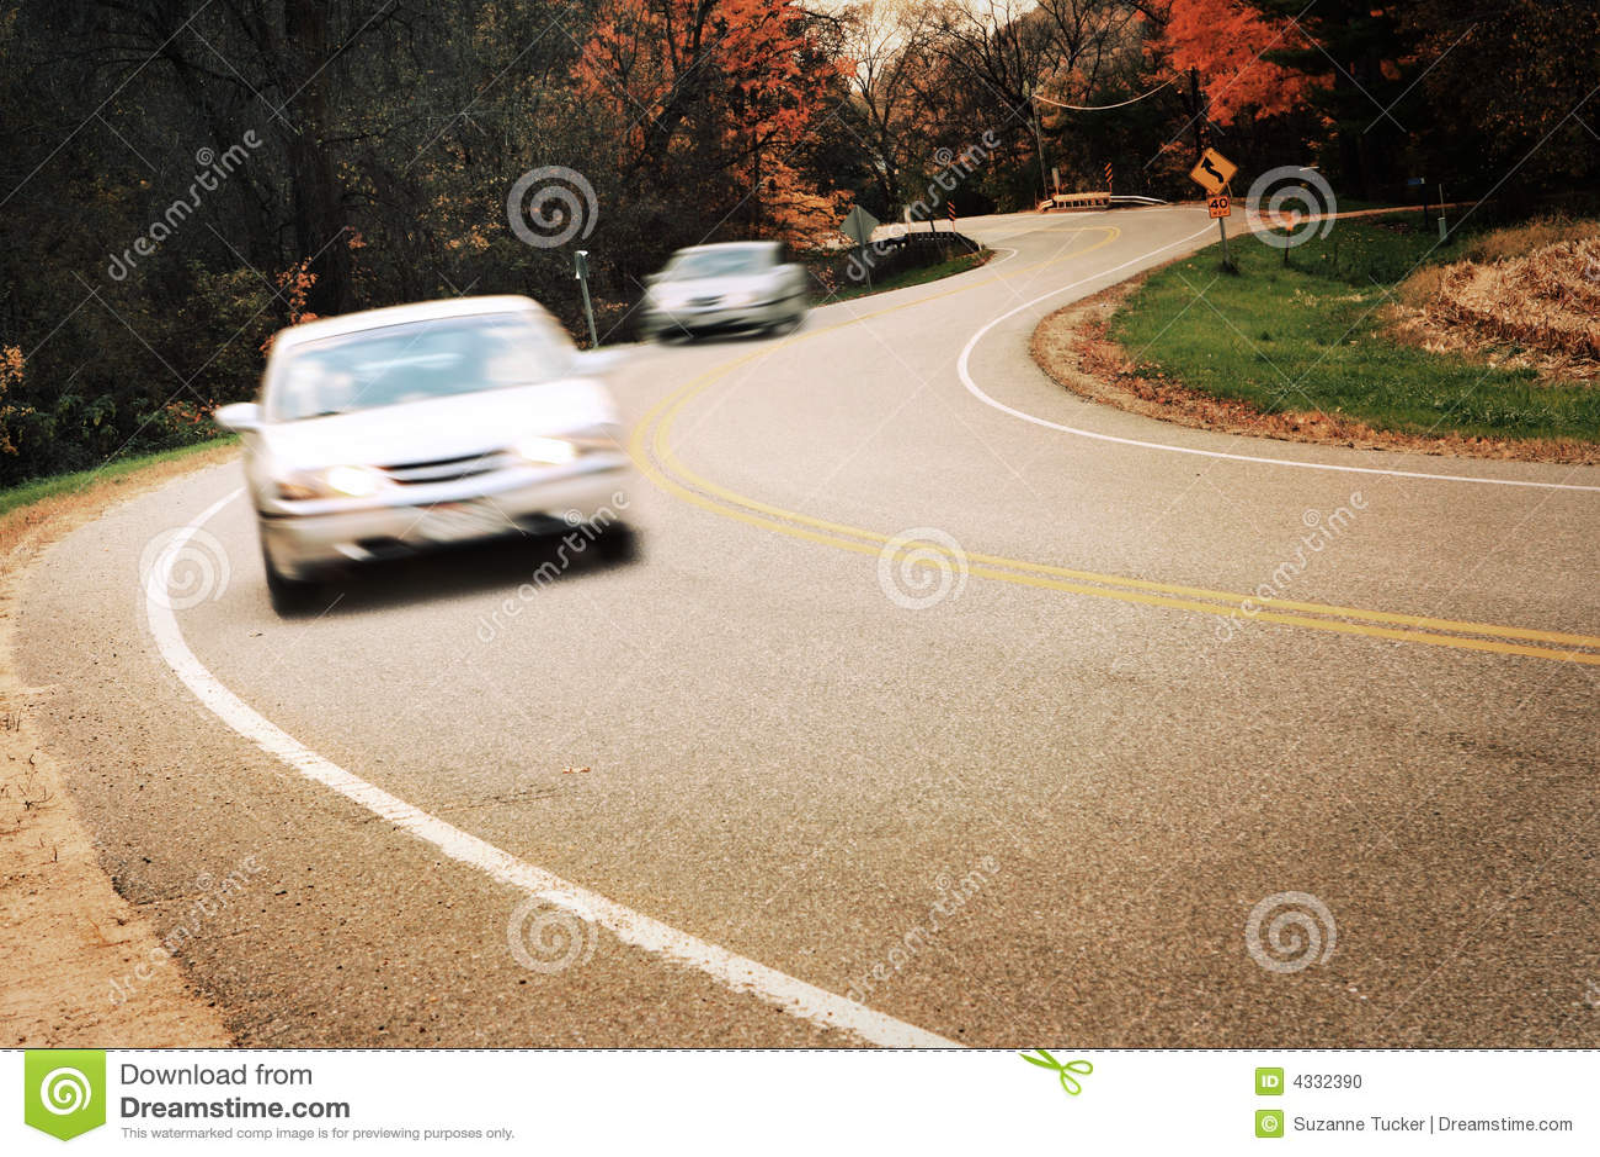 Turn around sign stock image image 35488961 - Around The Curve Motion Blur Stock Photo